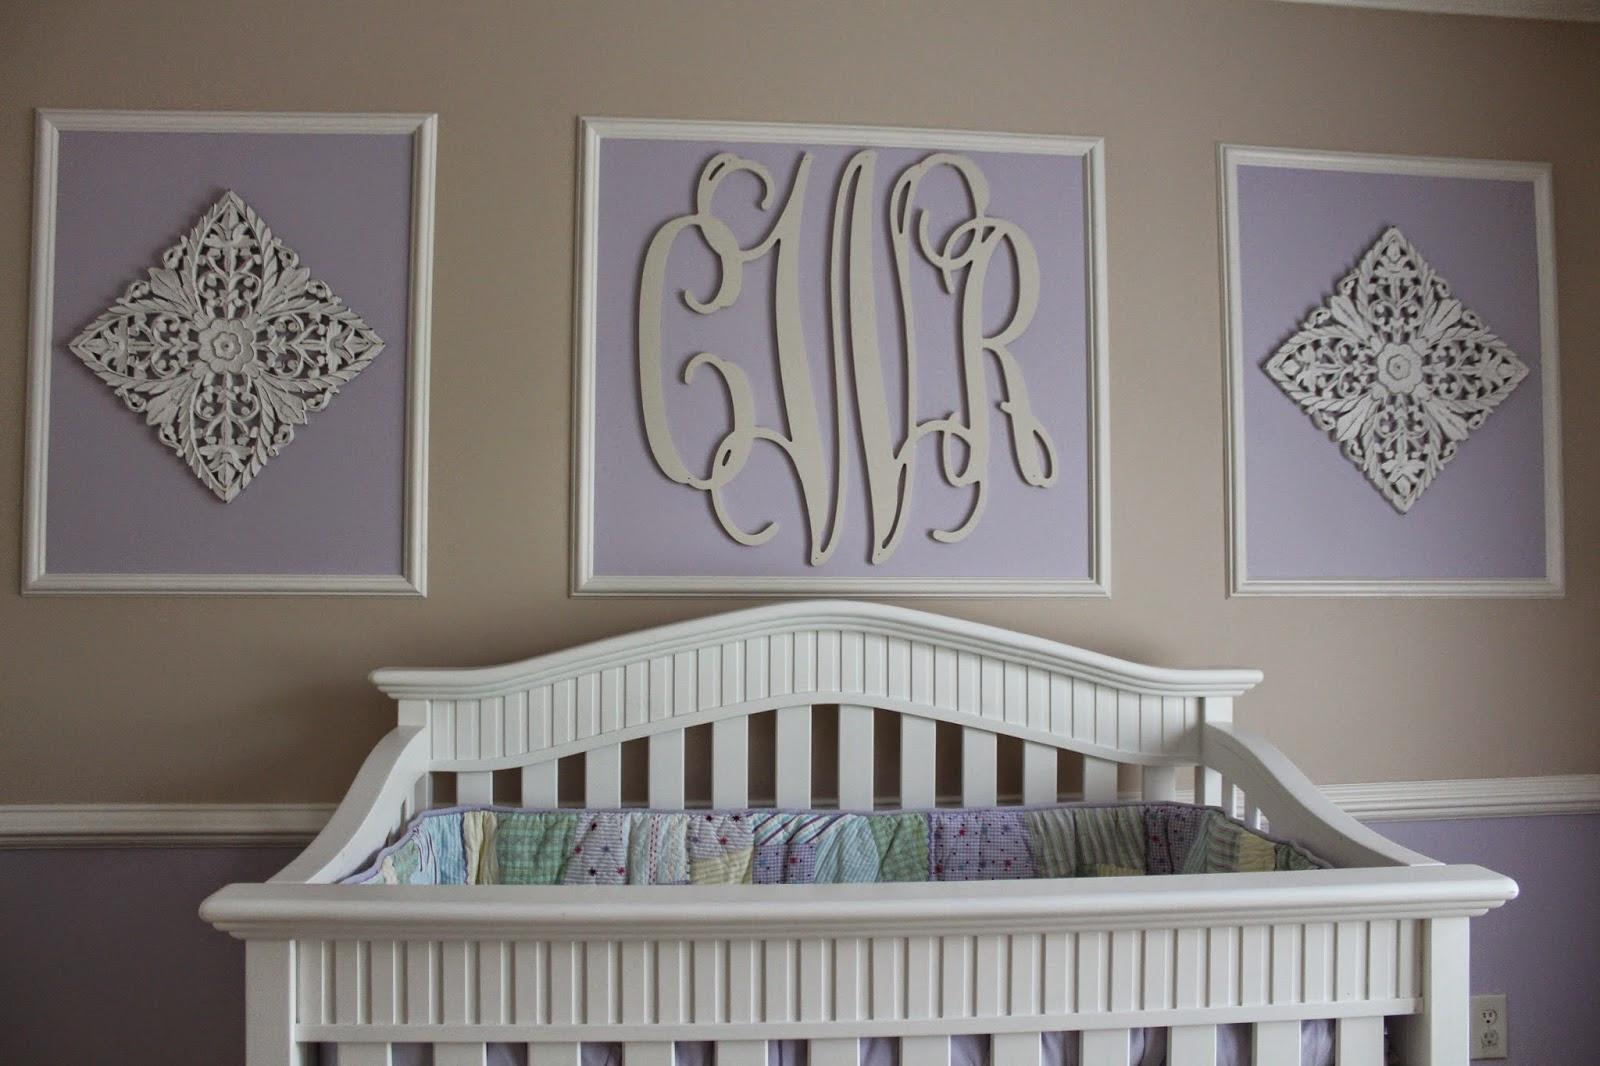 Baby Monogram Wall Decor David Jen Max Colettes Nursery